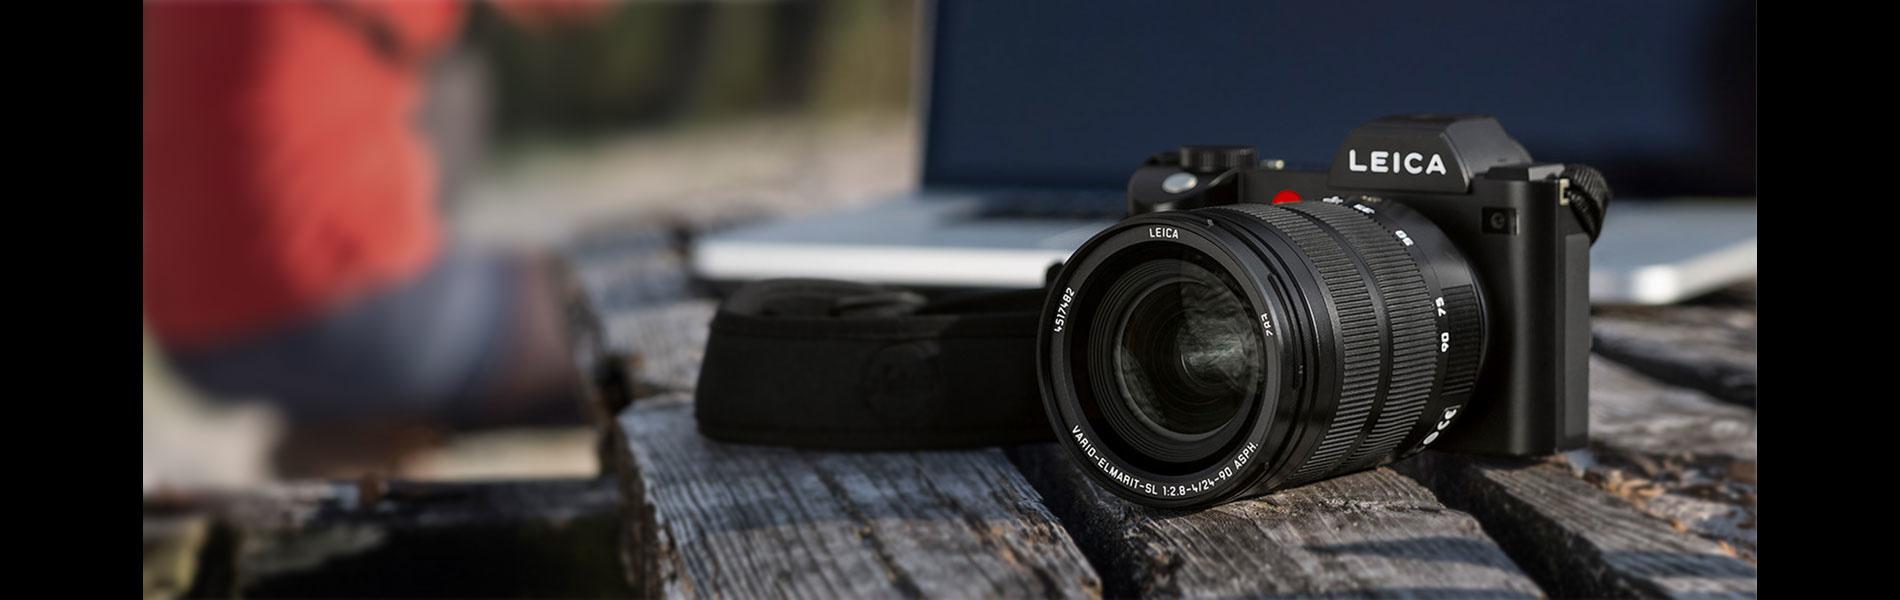 Leica SL Bundles